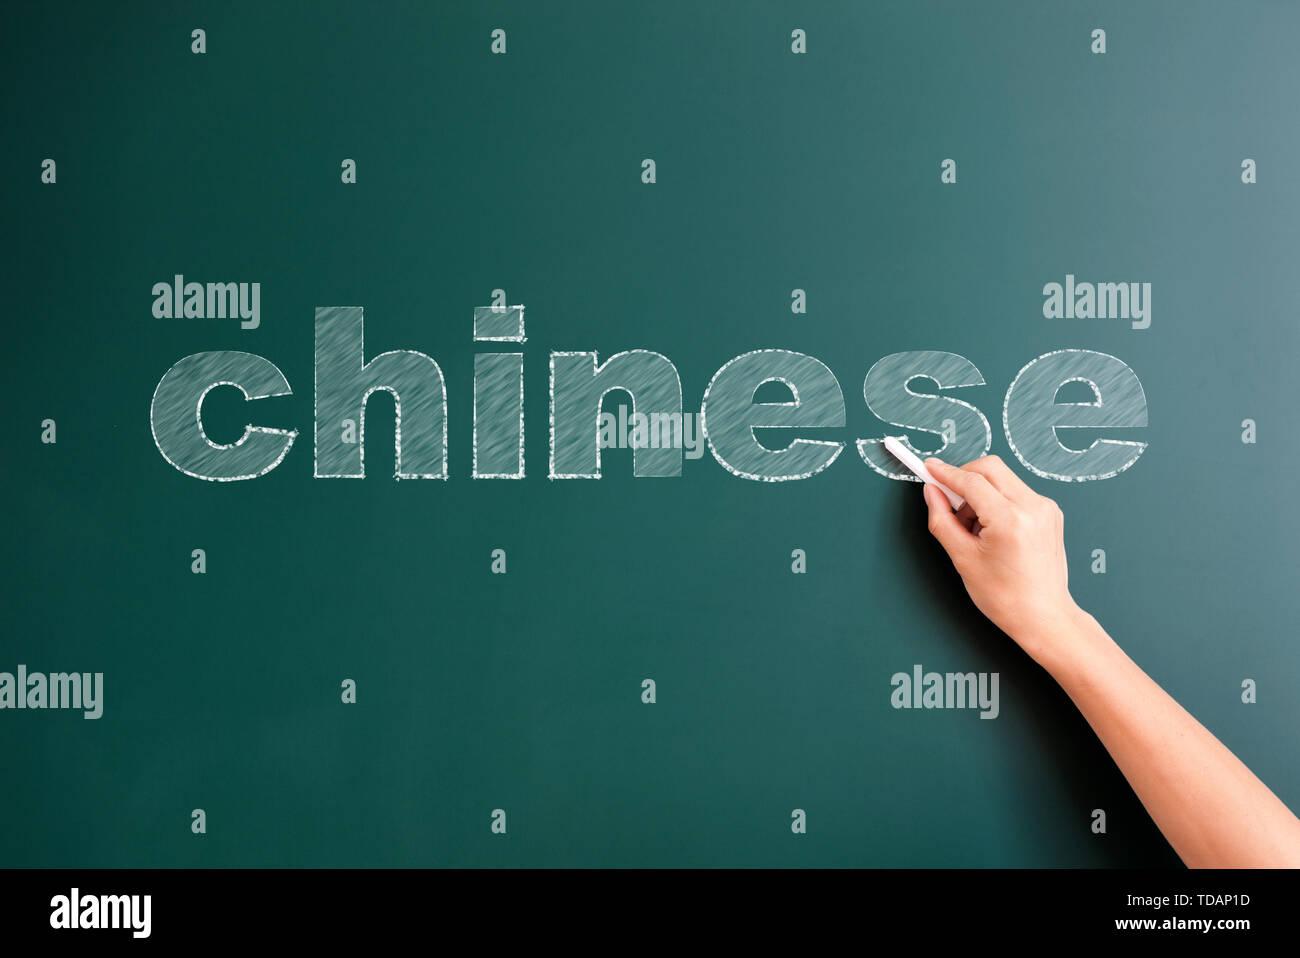 chinese written on blackboard - Stock Image